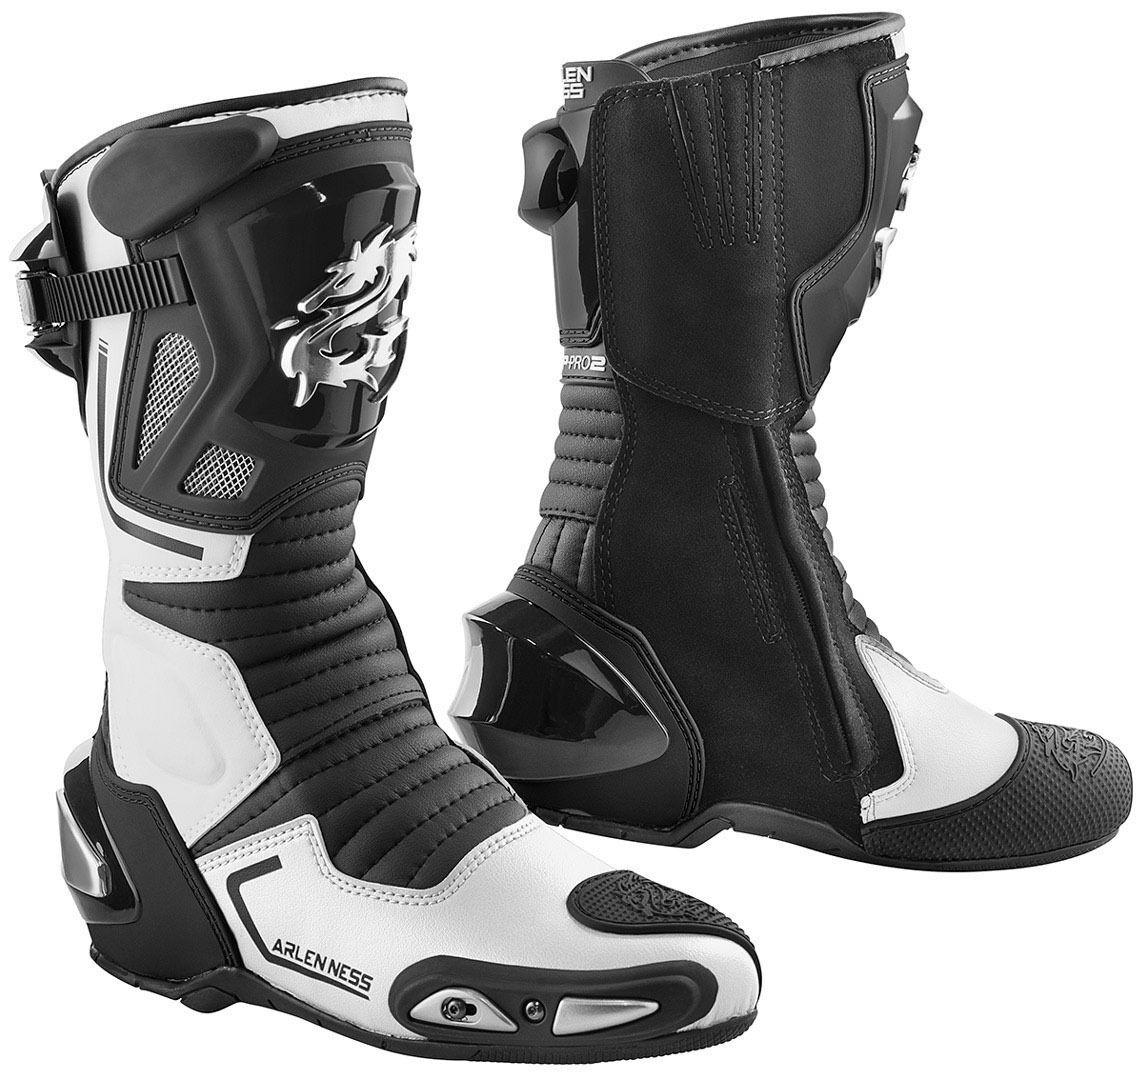 Arlen Ness Sugello Bottes de moto Noir Blanc taille : 42